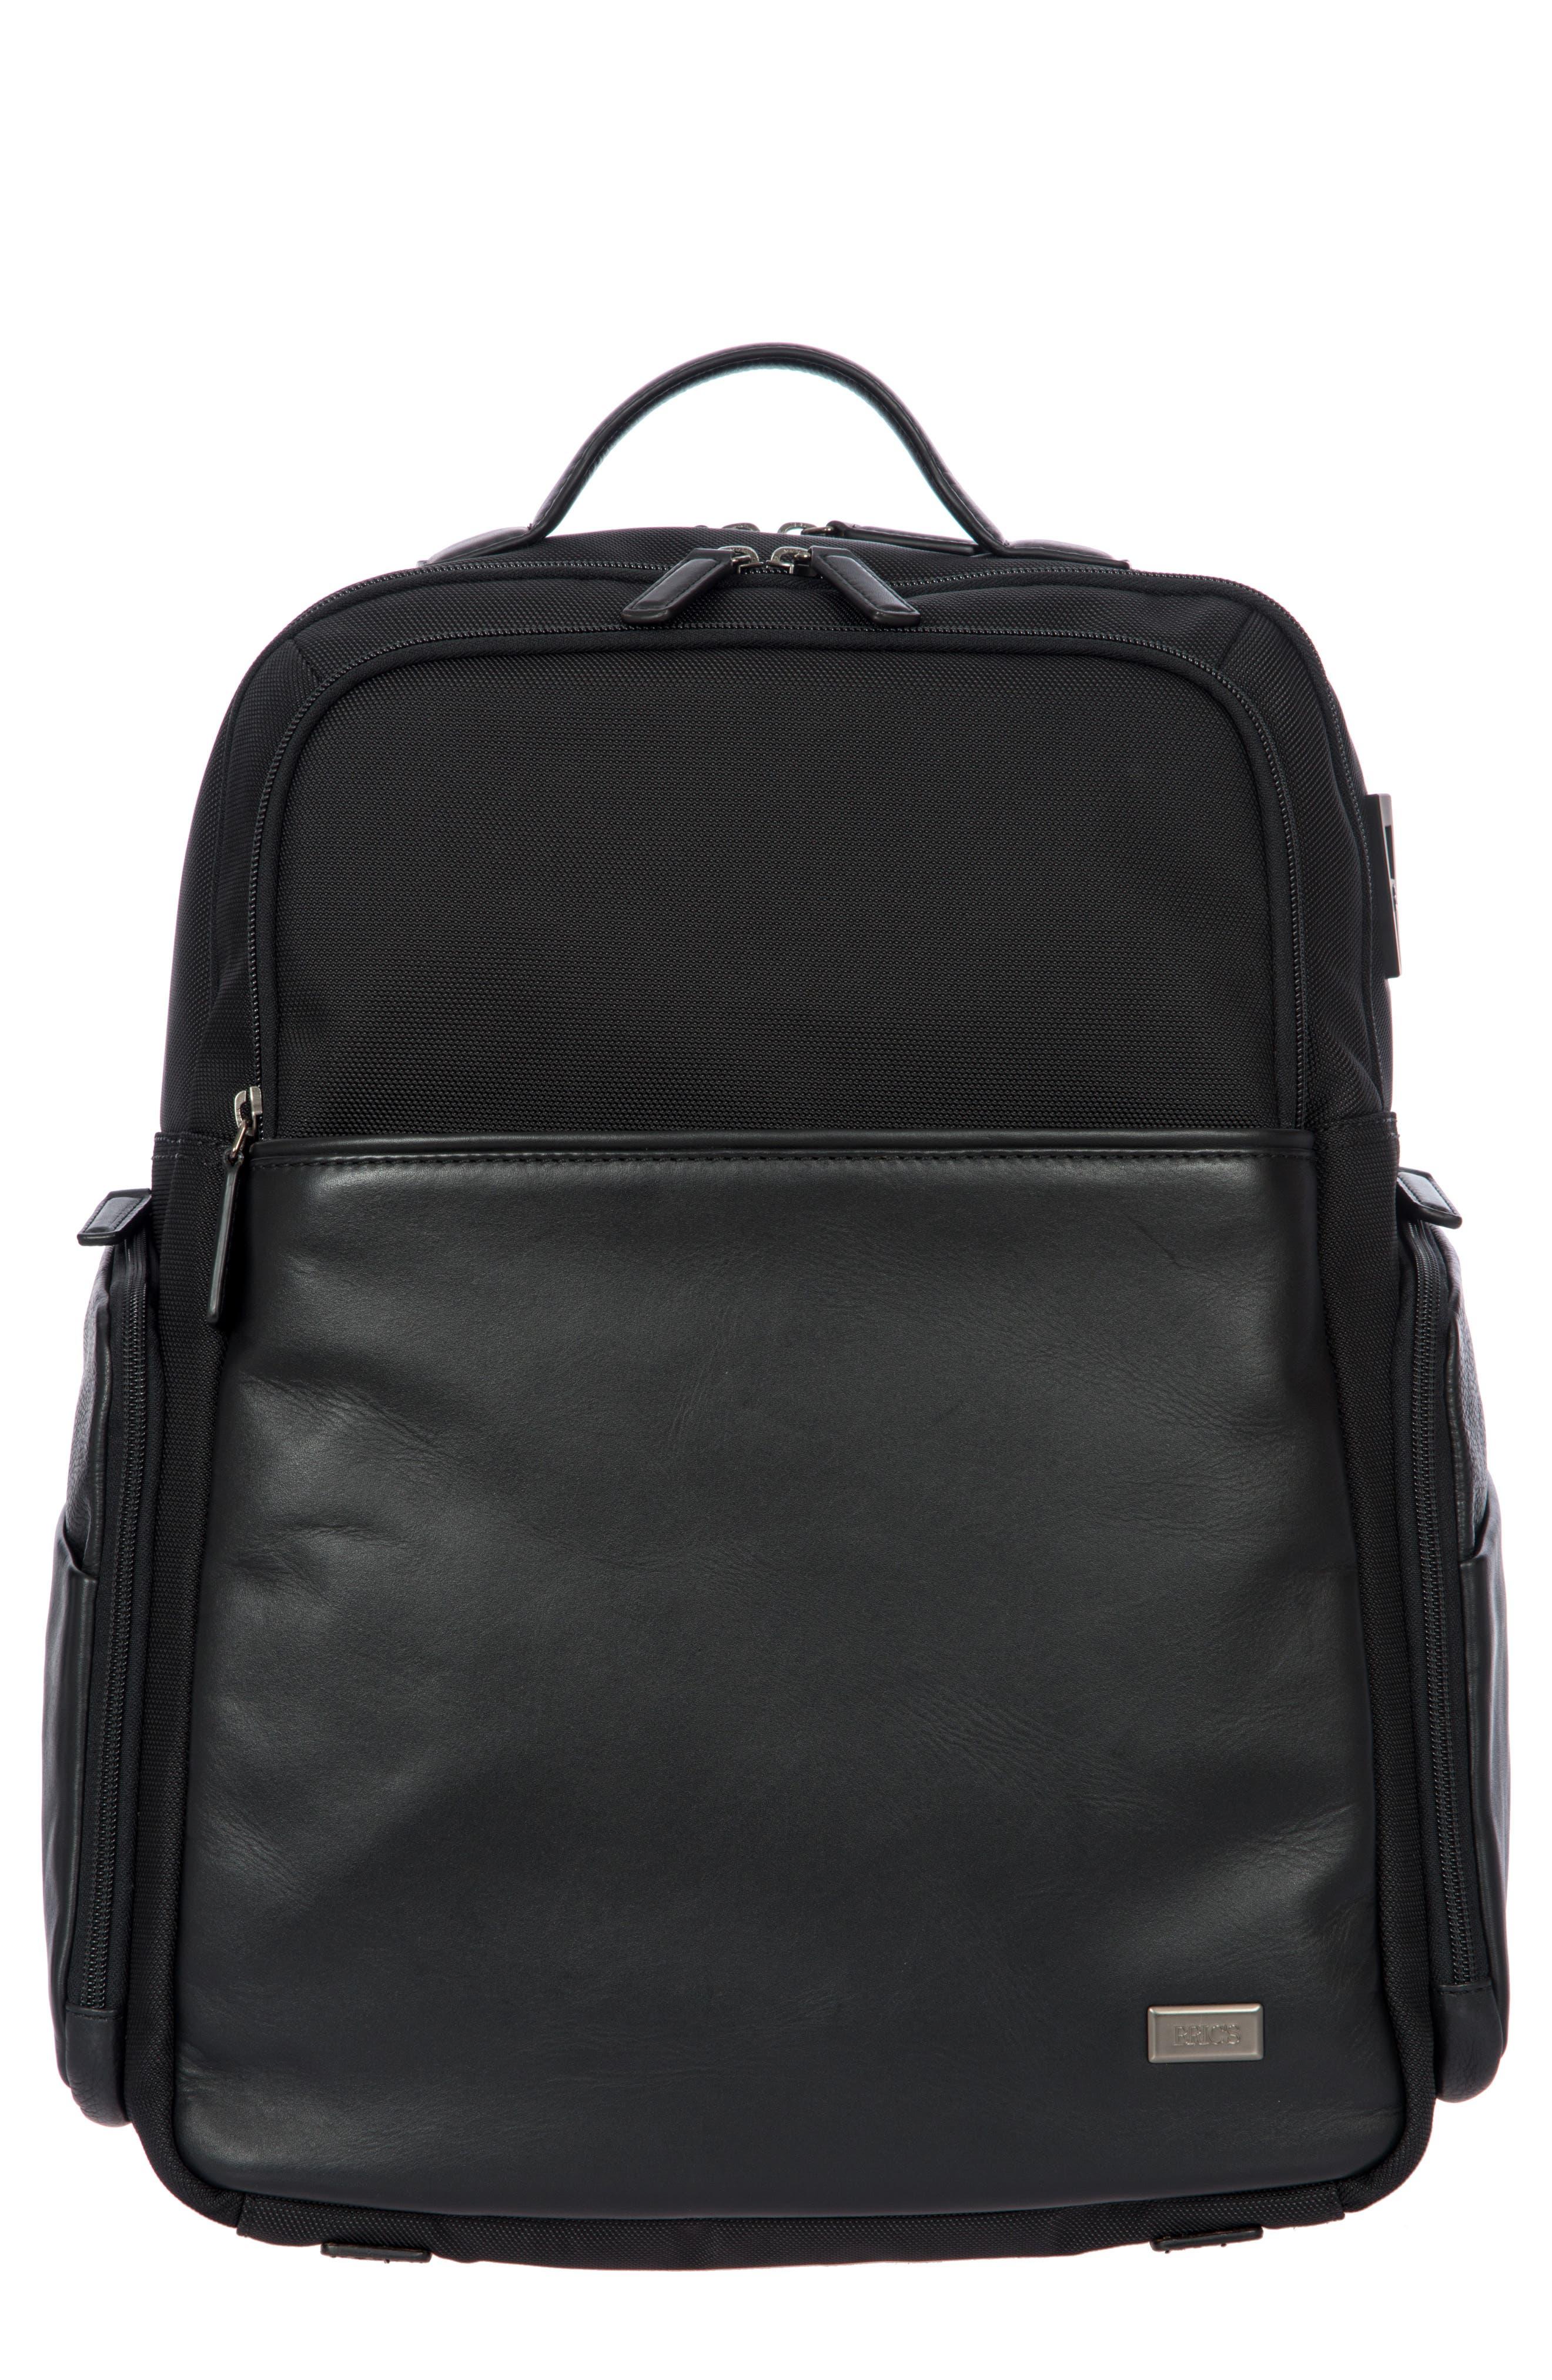 ead247c5f6ce Men's Bric's Bags & Backpacks | Nordstrom